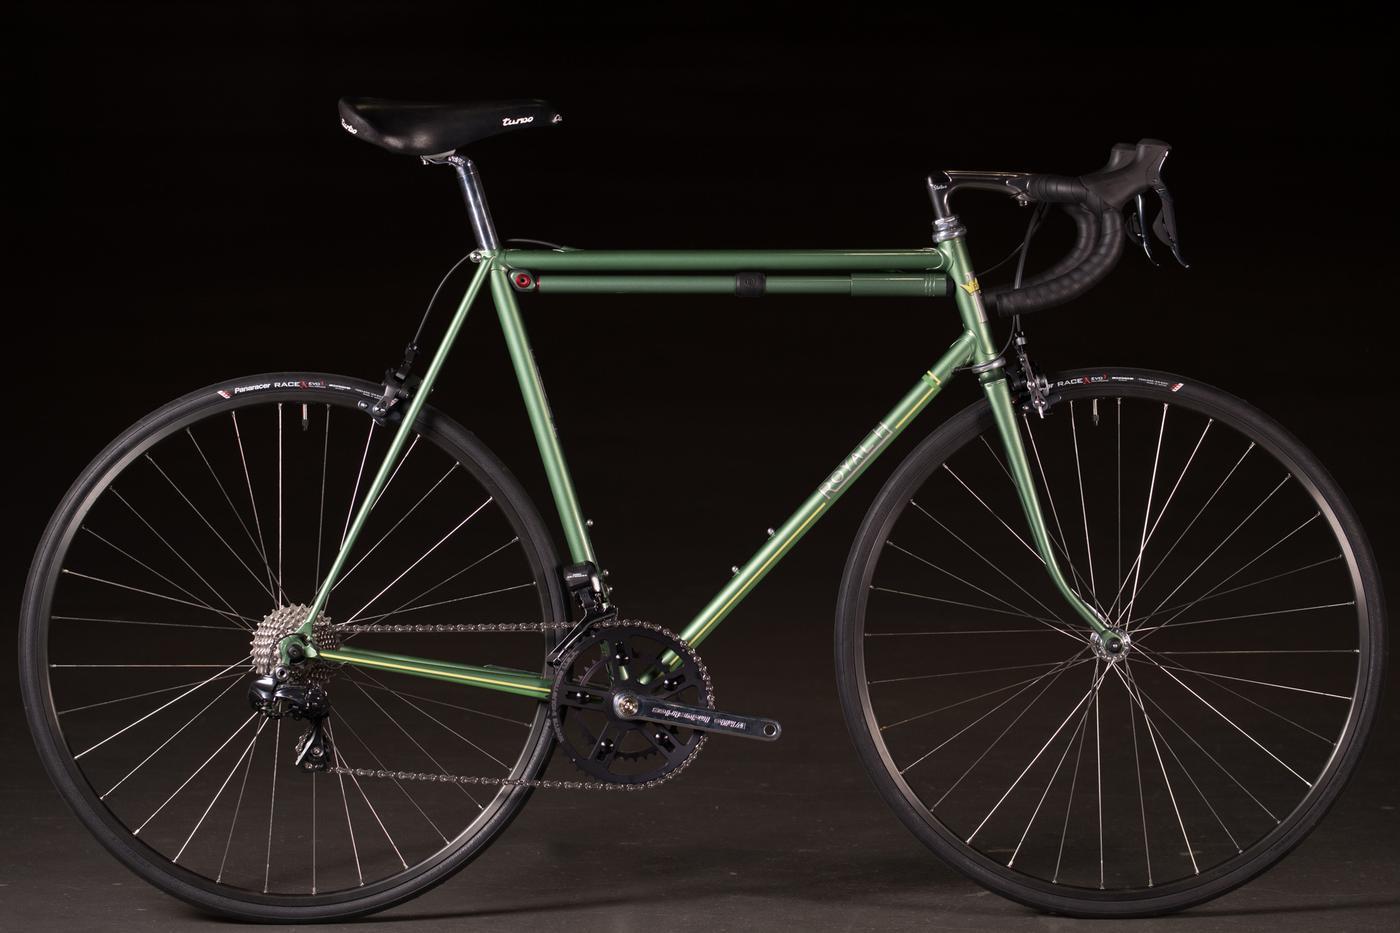 373c8e9f799 The Radavist | A group of individuals who share a love of cycling ...